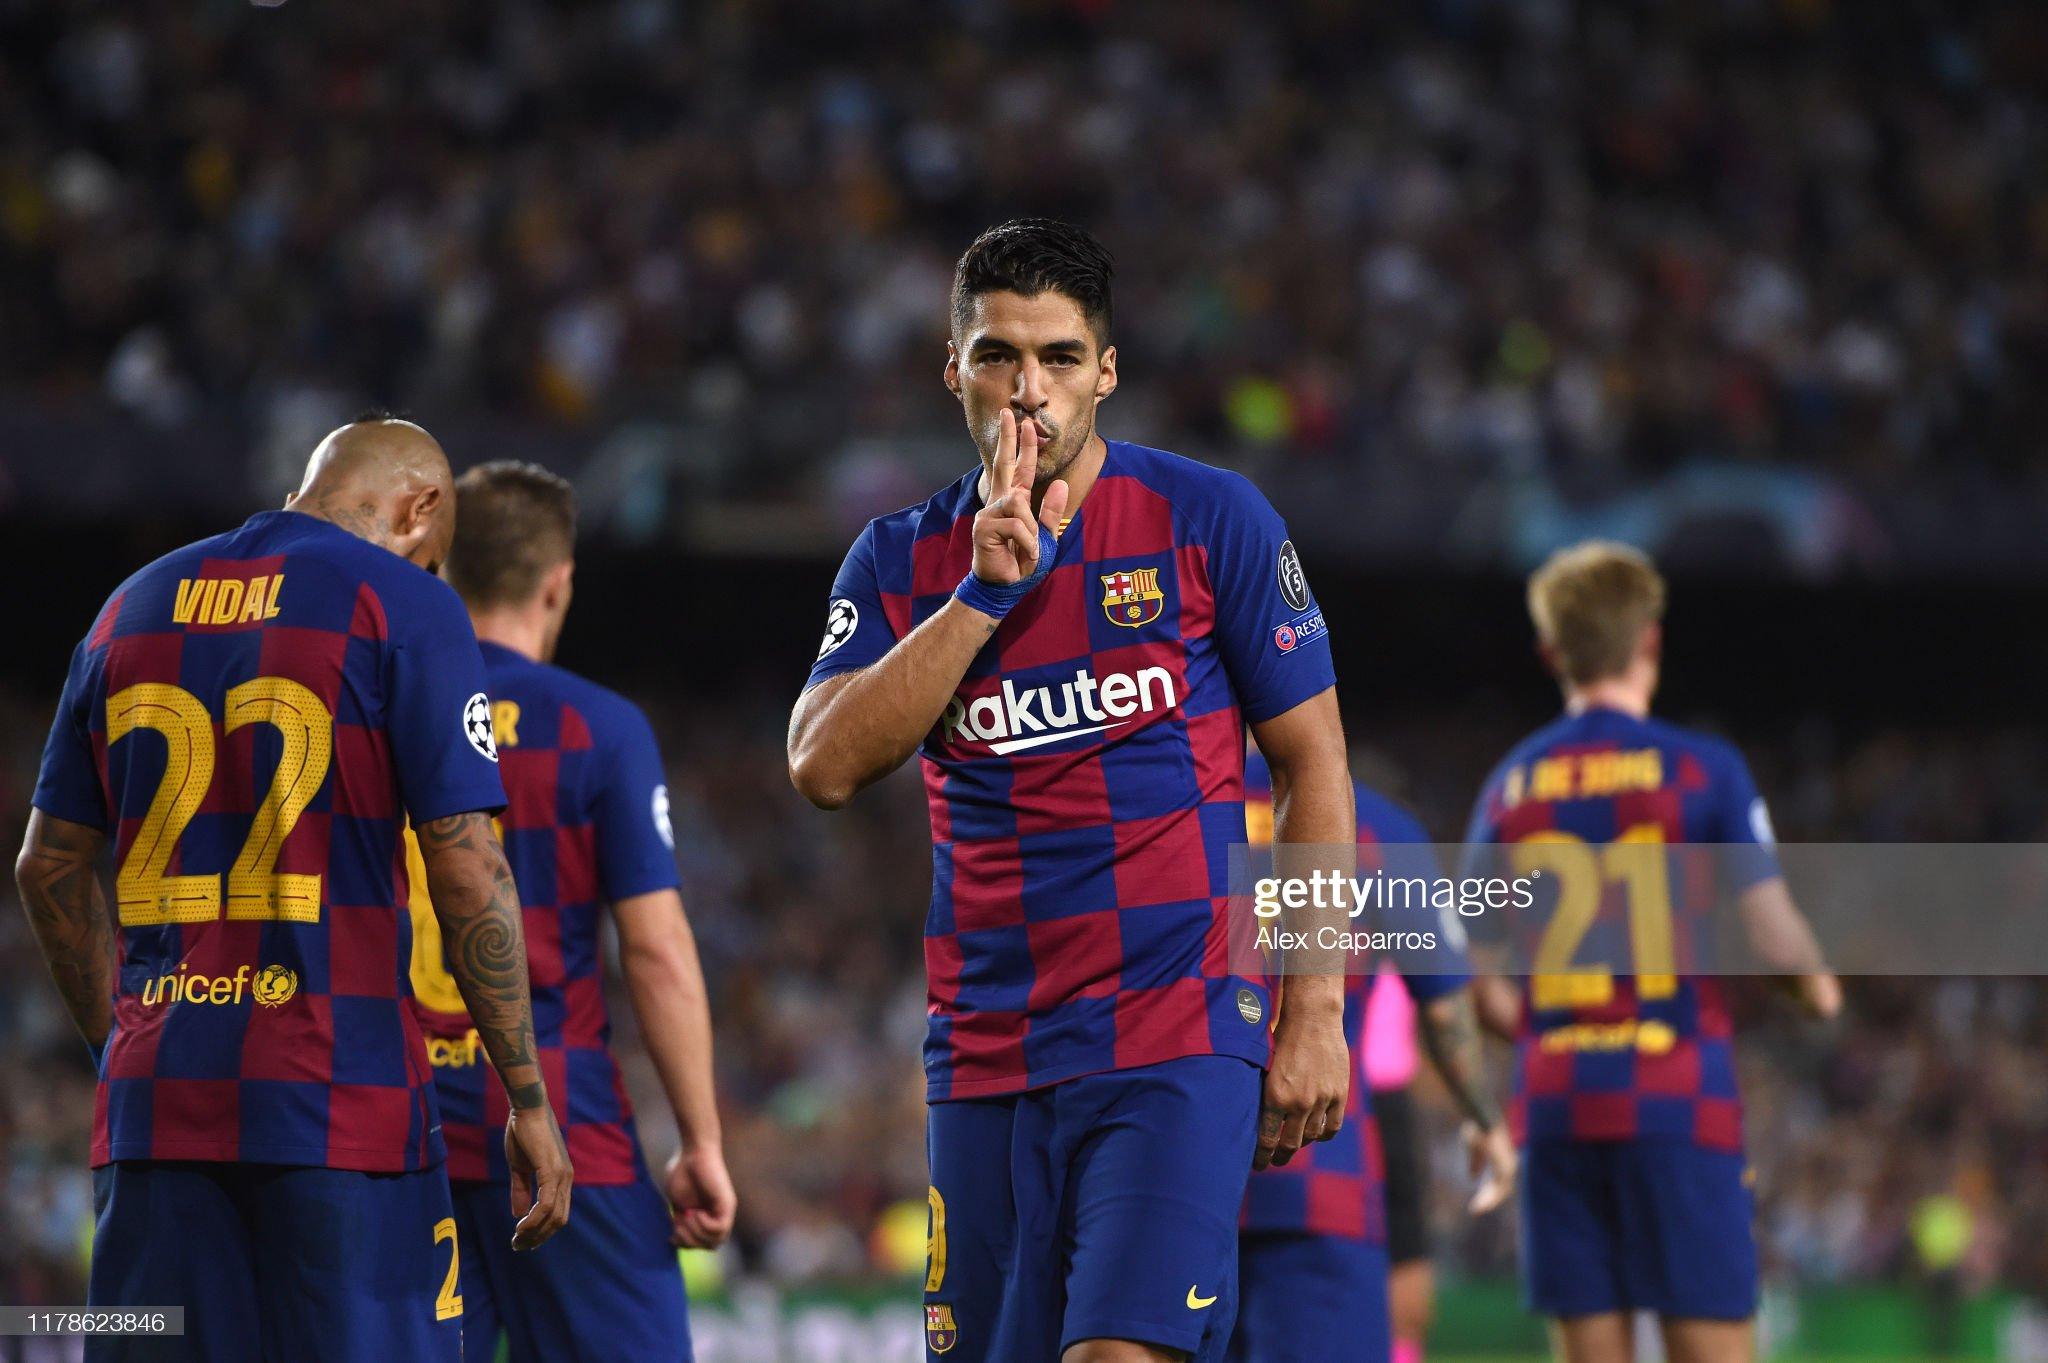 صور مباراة : برشلونة - إنتر 2-1 ( 02-10-2019 )  Luis-suarez-of-fc-barcelona-celebrates-after-he-scores-his-sides-picture-id1178623846?s=2048x2048